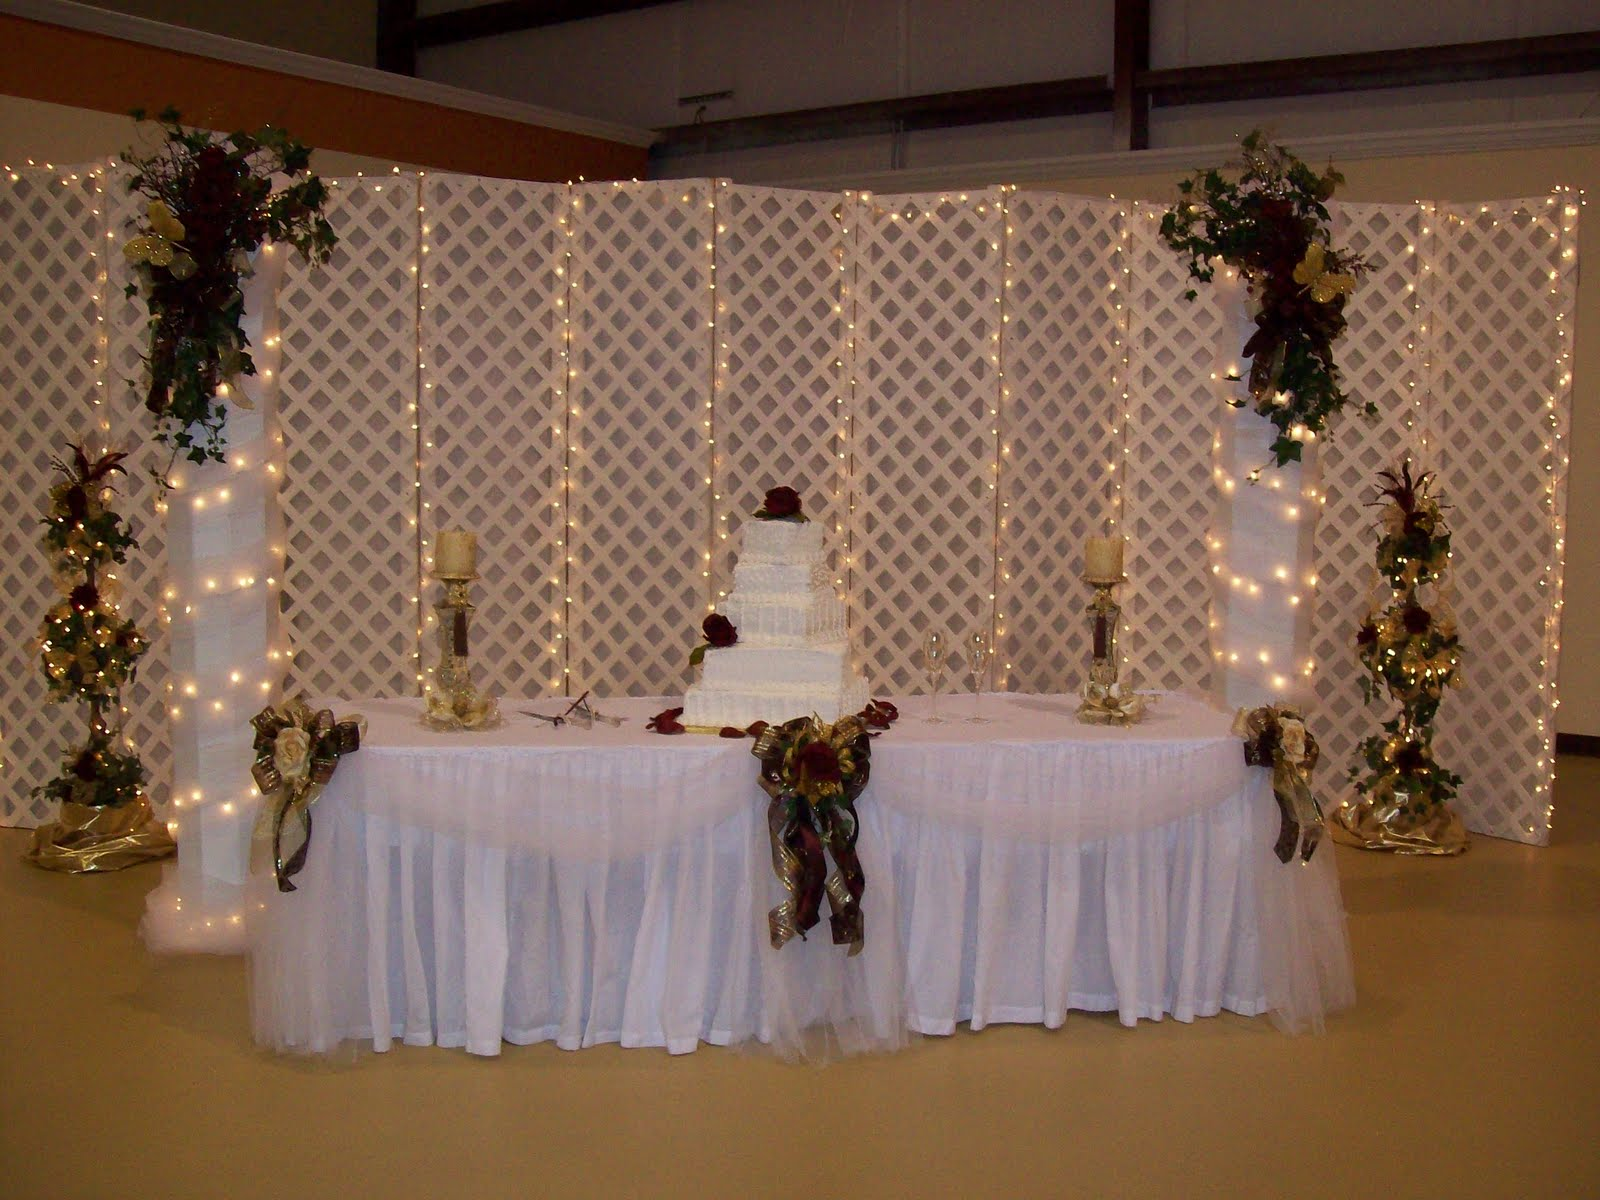 Bride Groom Table Decoration Jazzy Jennis World Bride And Grooms Table And Decorated Columns